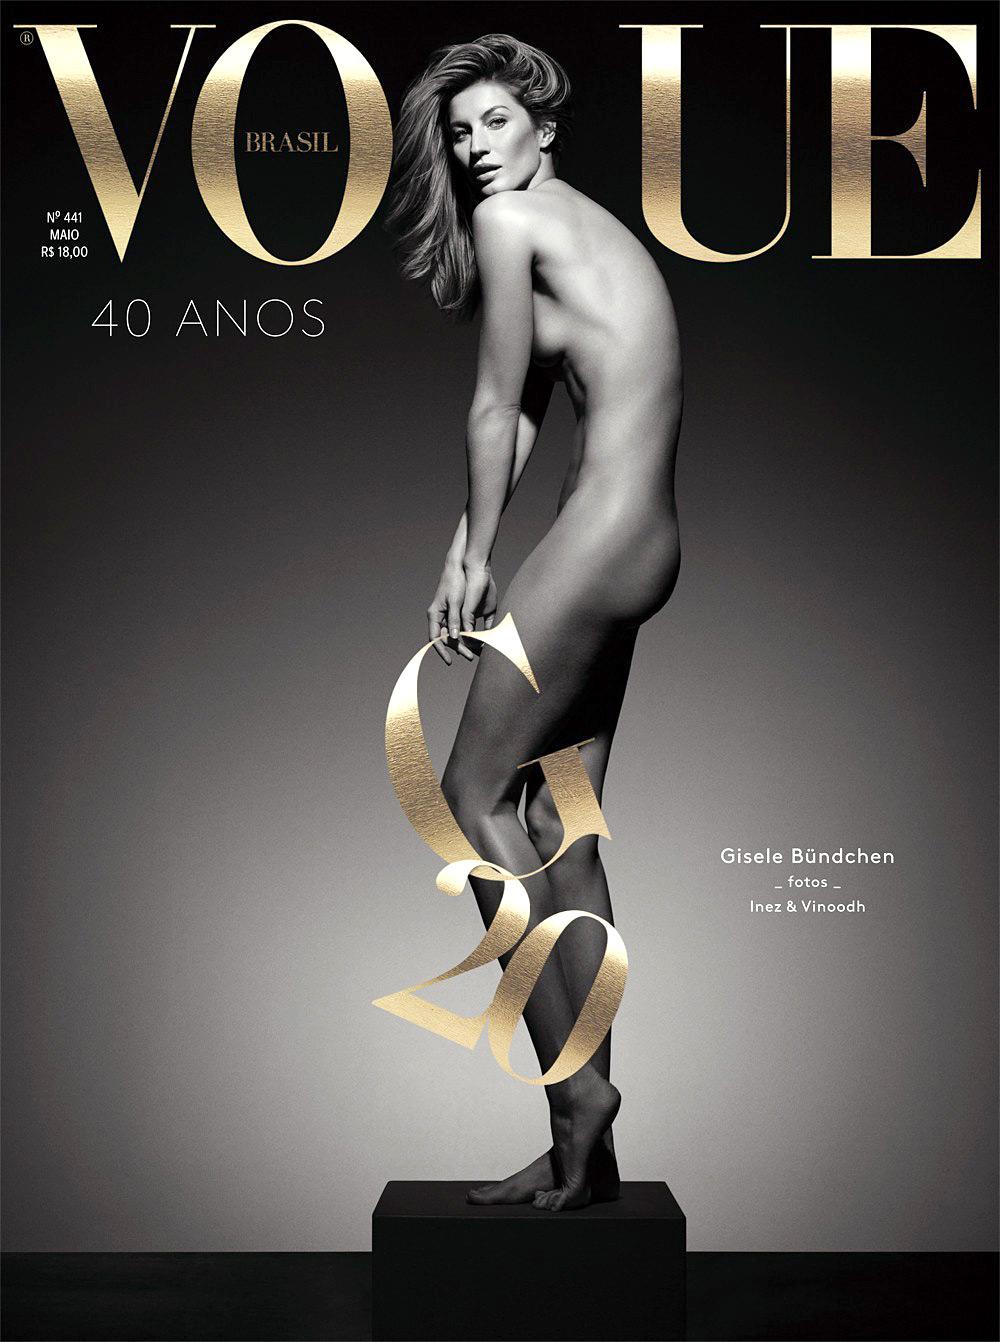 gisele bundchen 40 ans vogue bresil brazil zee nunes may 2015 cover birthday